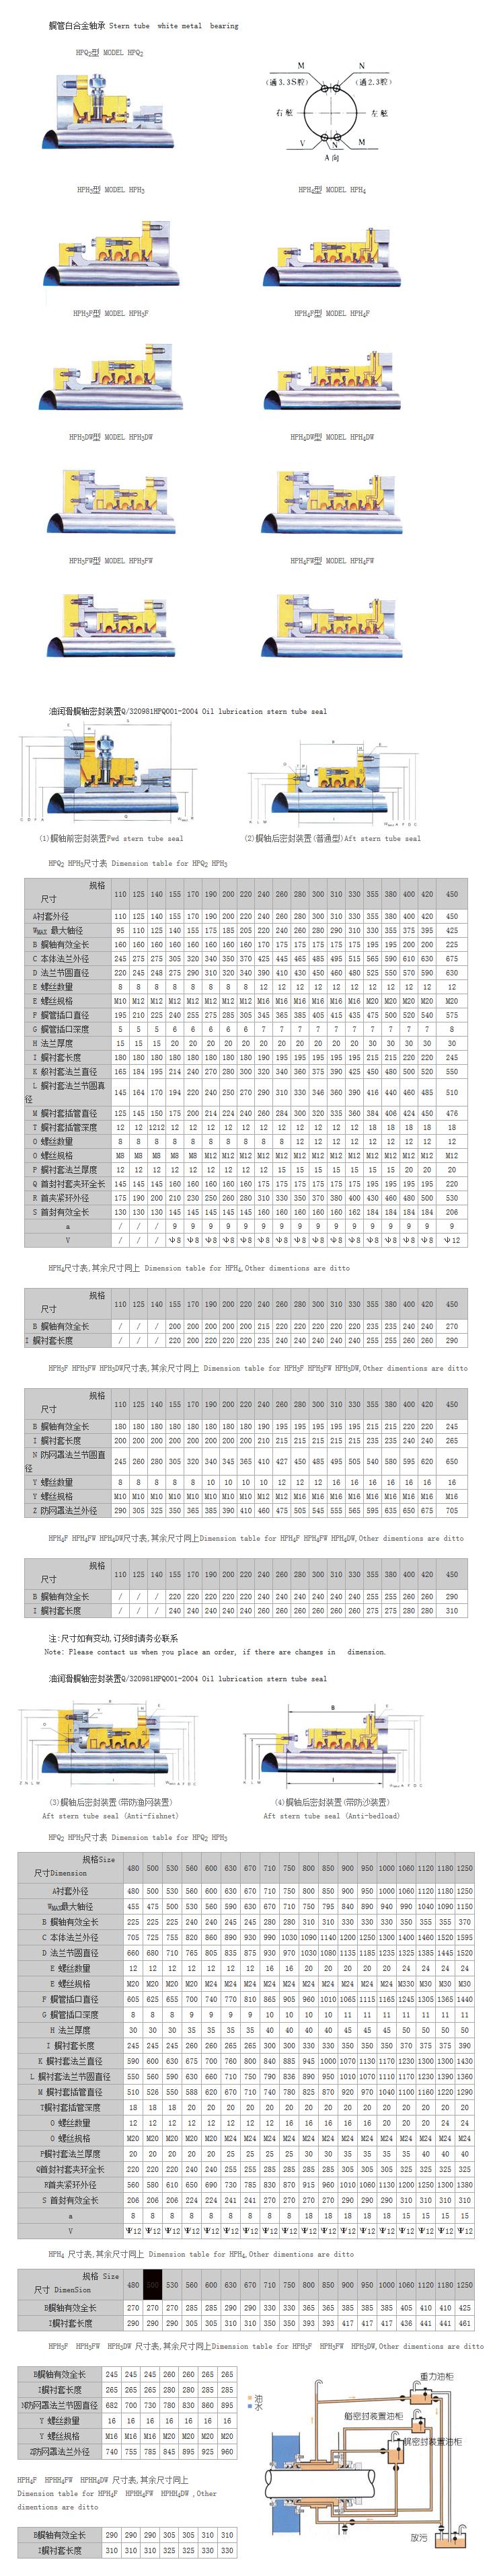 火狐截圖_2017-04-12T08-08-03.629Z.png